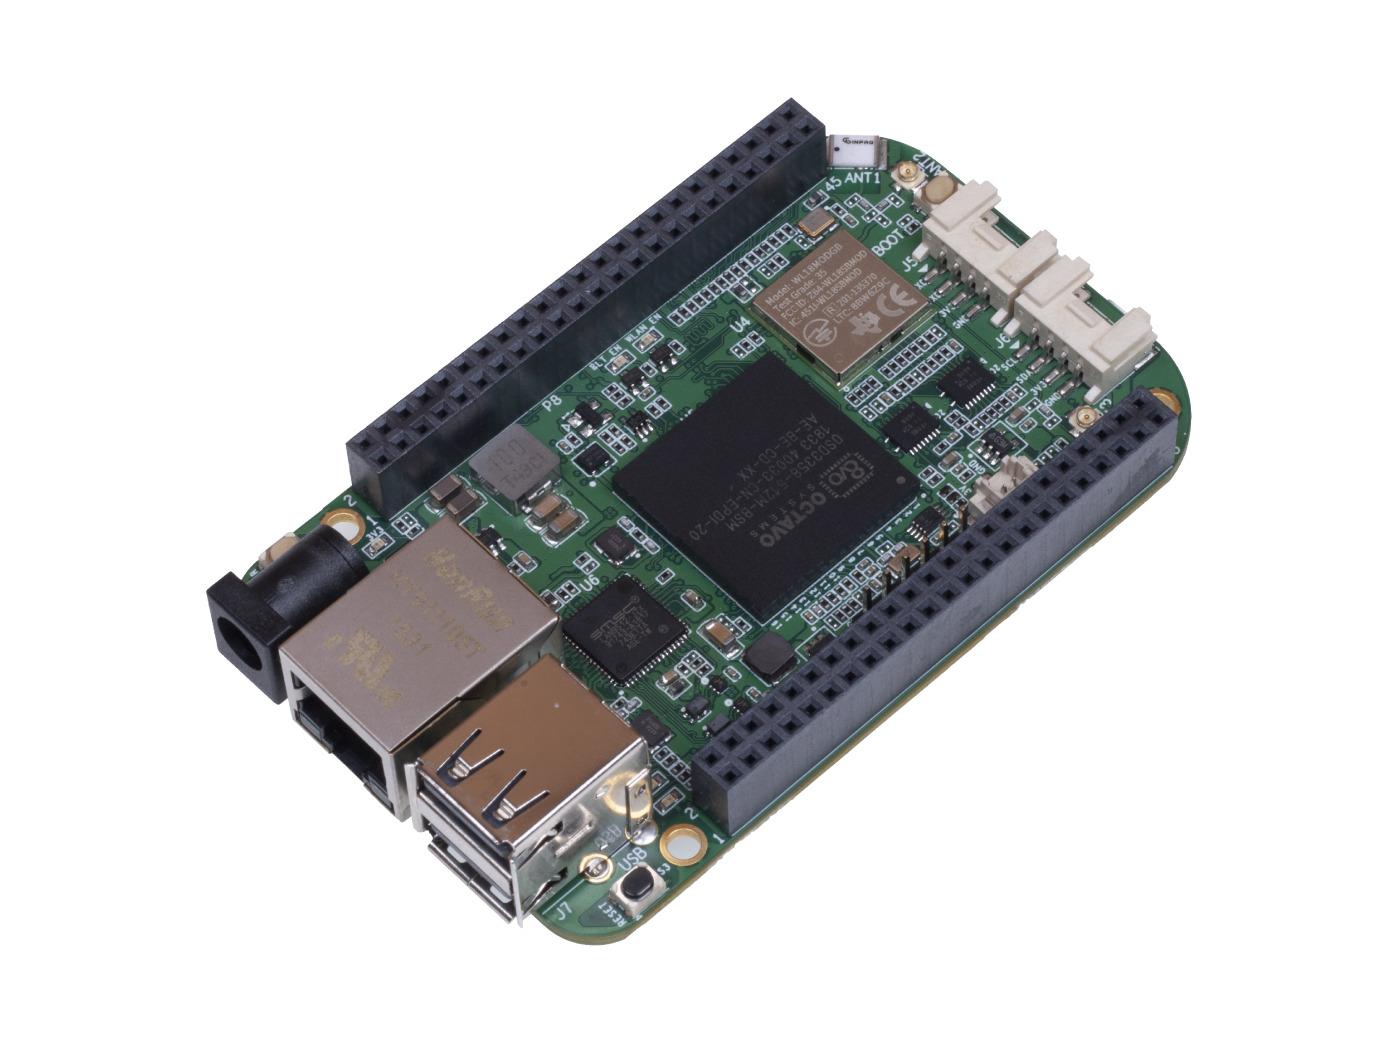 BeagleBone Green Gateway SBC features Sitara AM3358, Ethernet, and a DC Jack